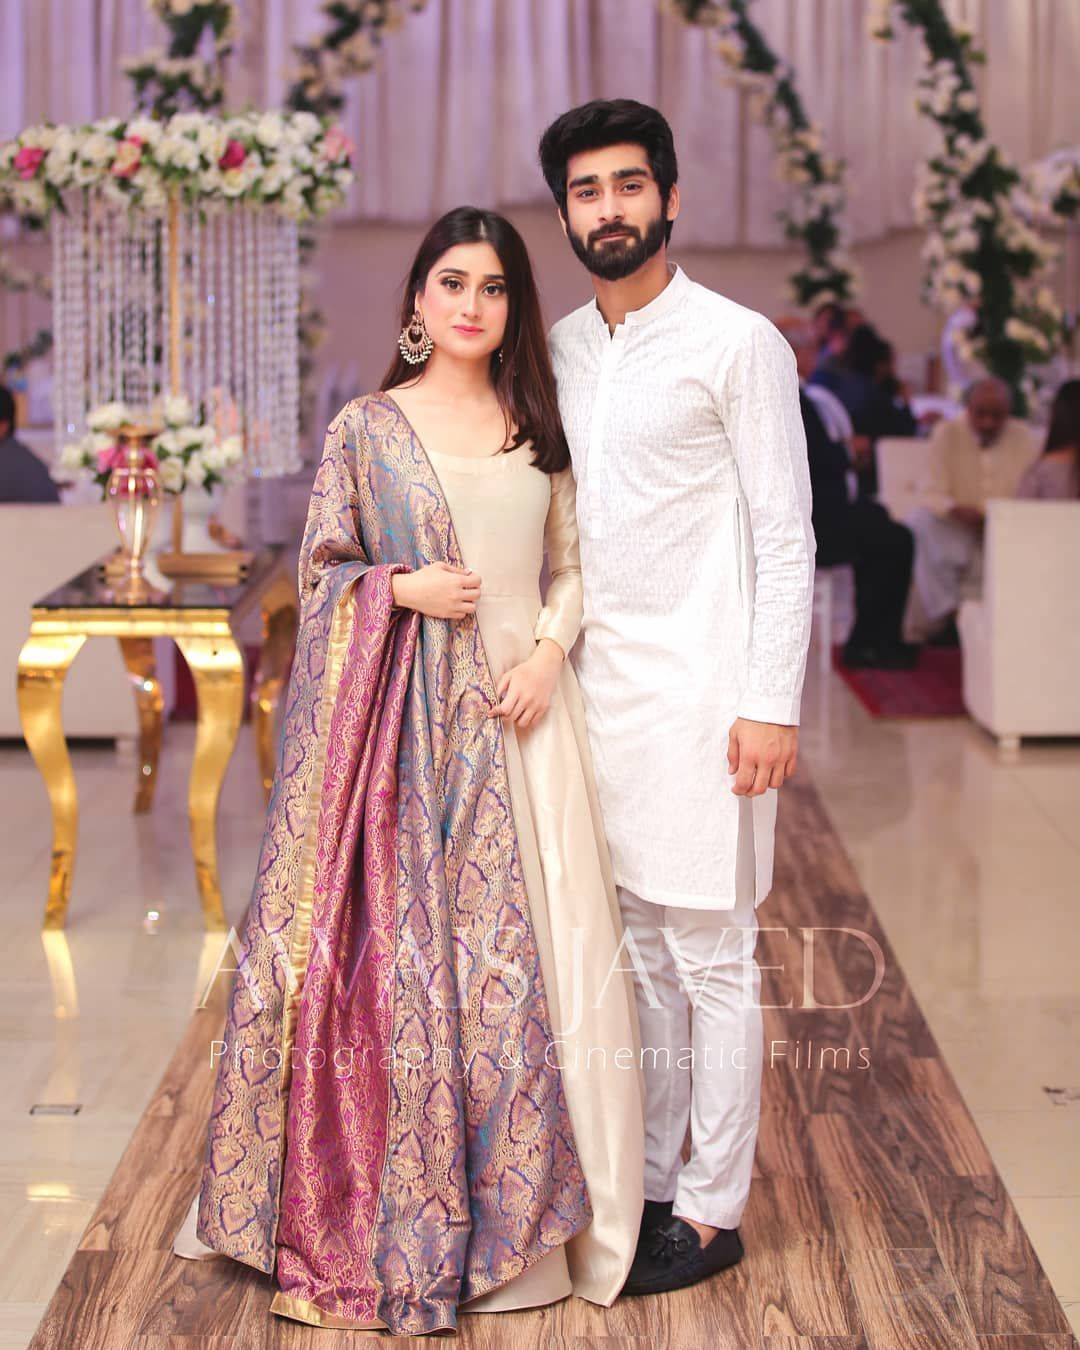 Awaisjavedphotography Awaisjaved Pakistan Weddings Pakistaniweddings Islamabad Karachi Indian Gowns Dresses Fashion Dress Party Pakistani Formal Dresses